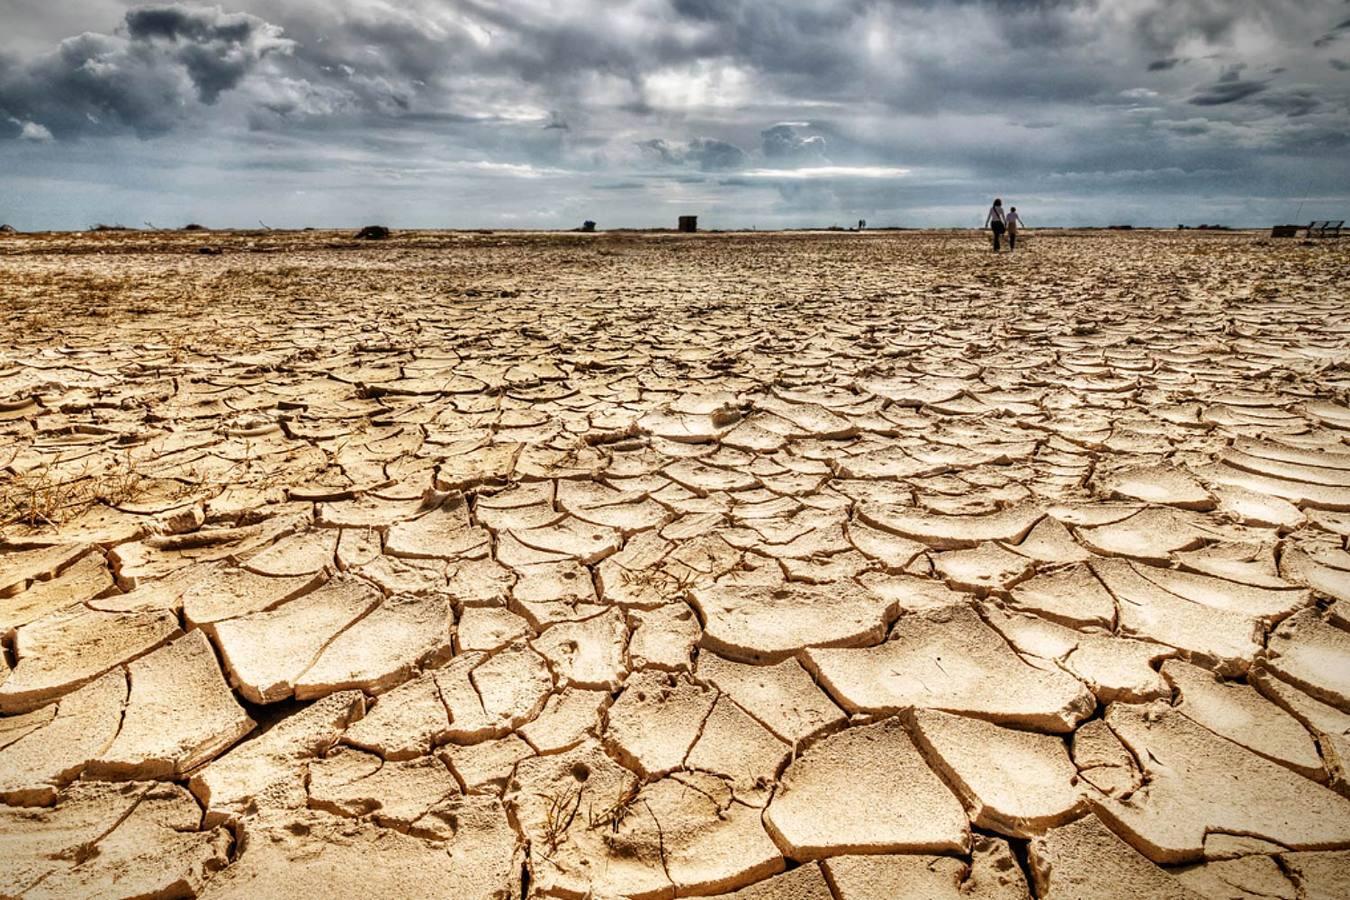 Cambio Climático: ¿Quedan escépticos? Diez fotos para ellos